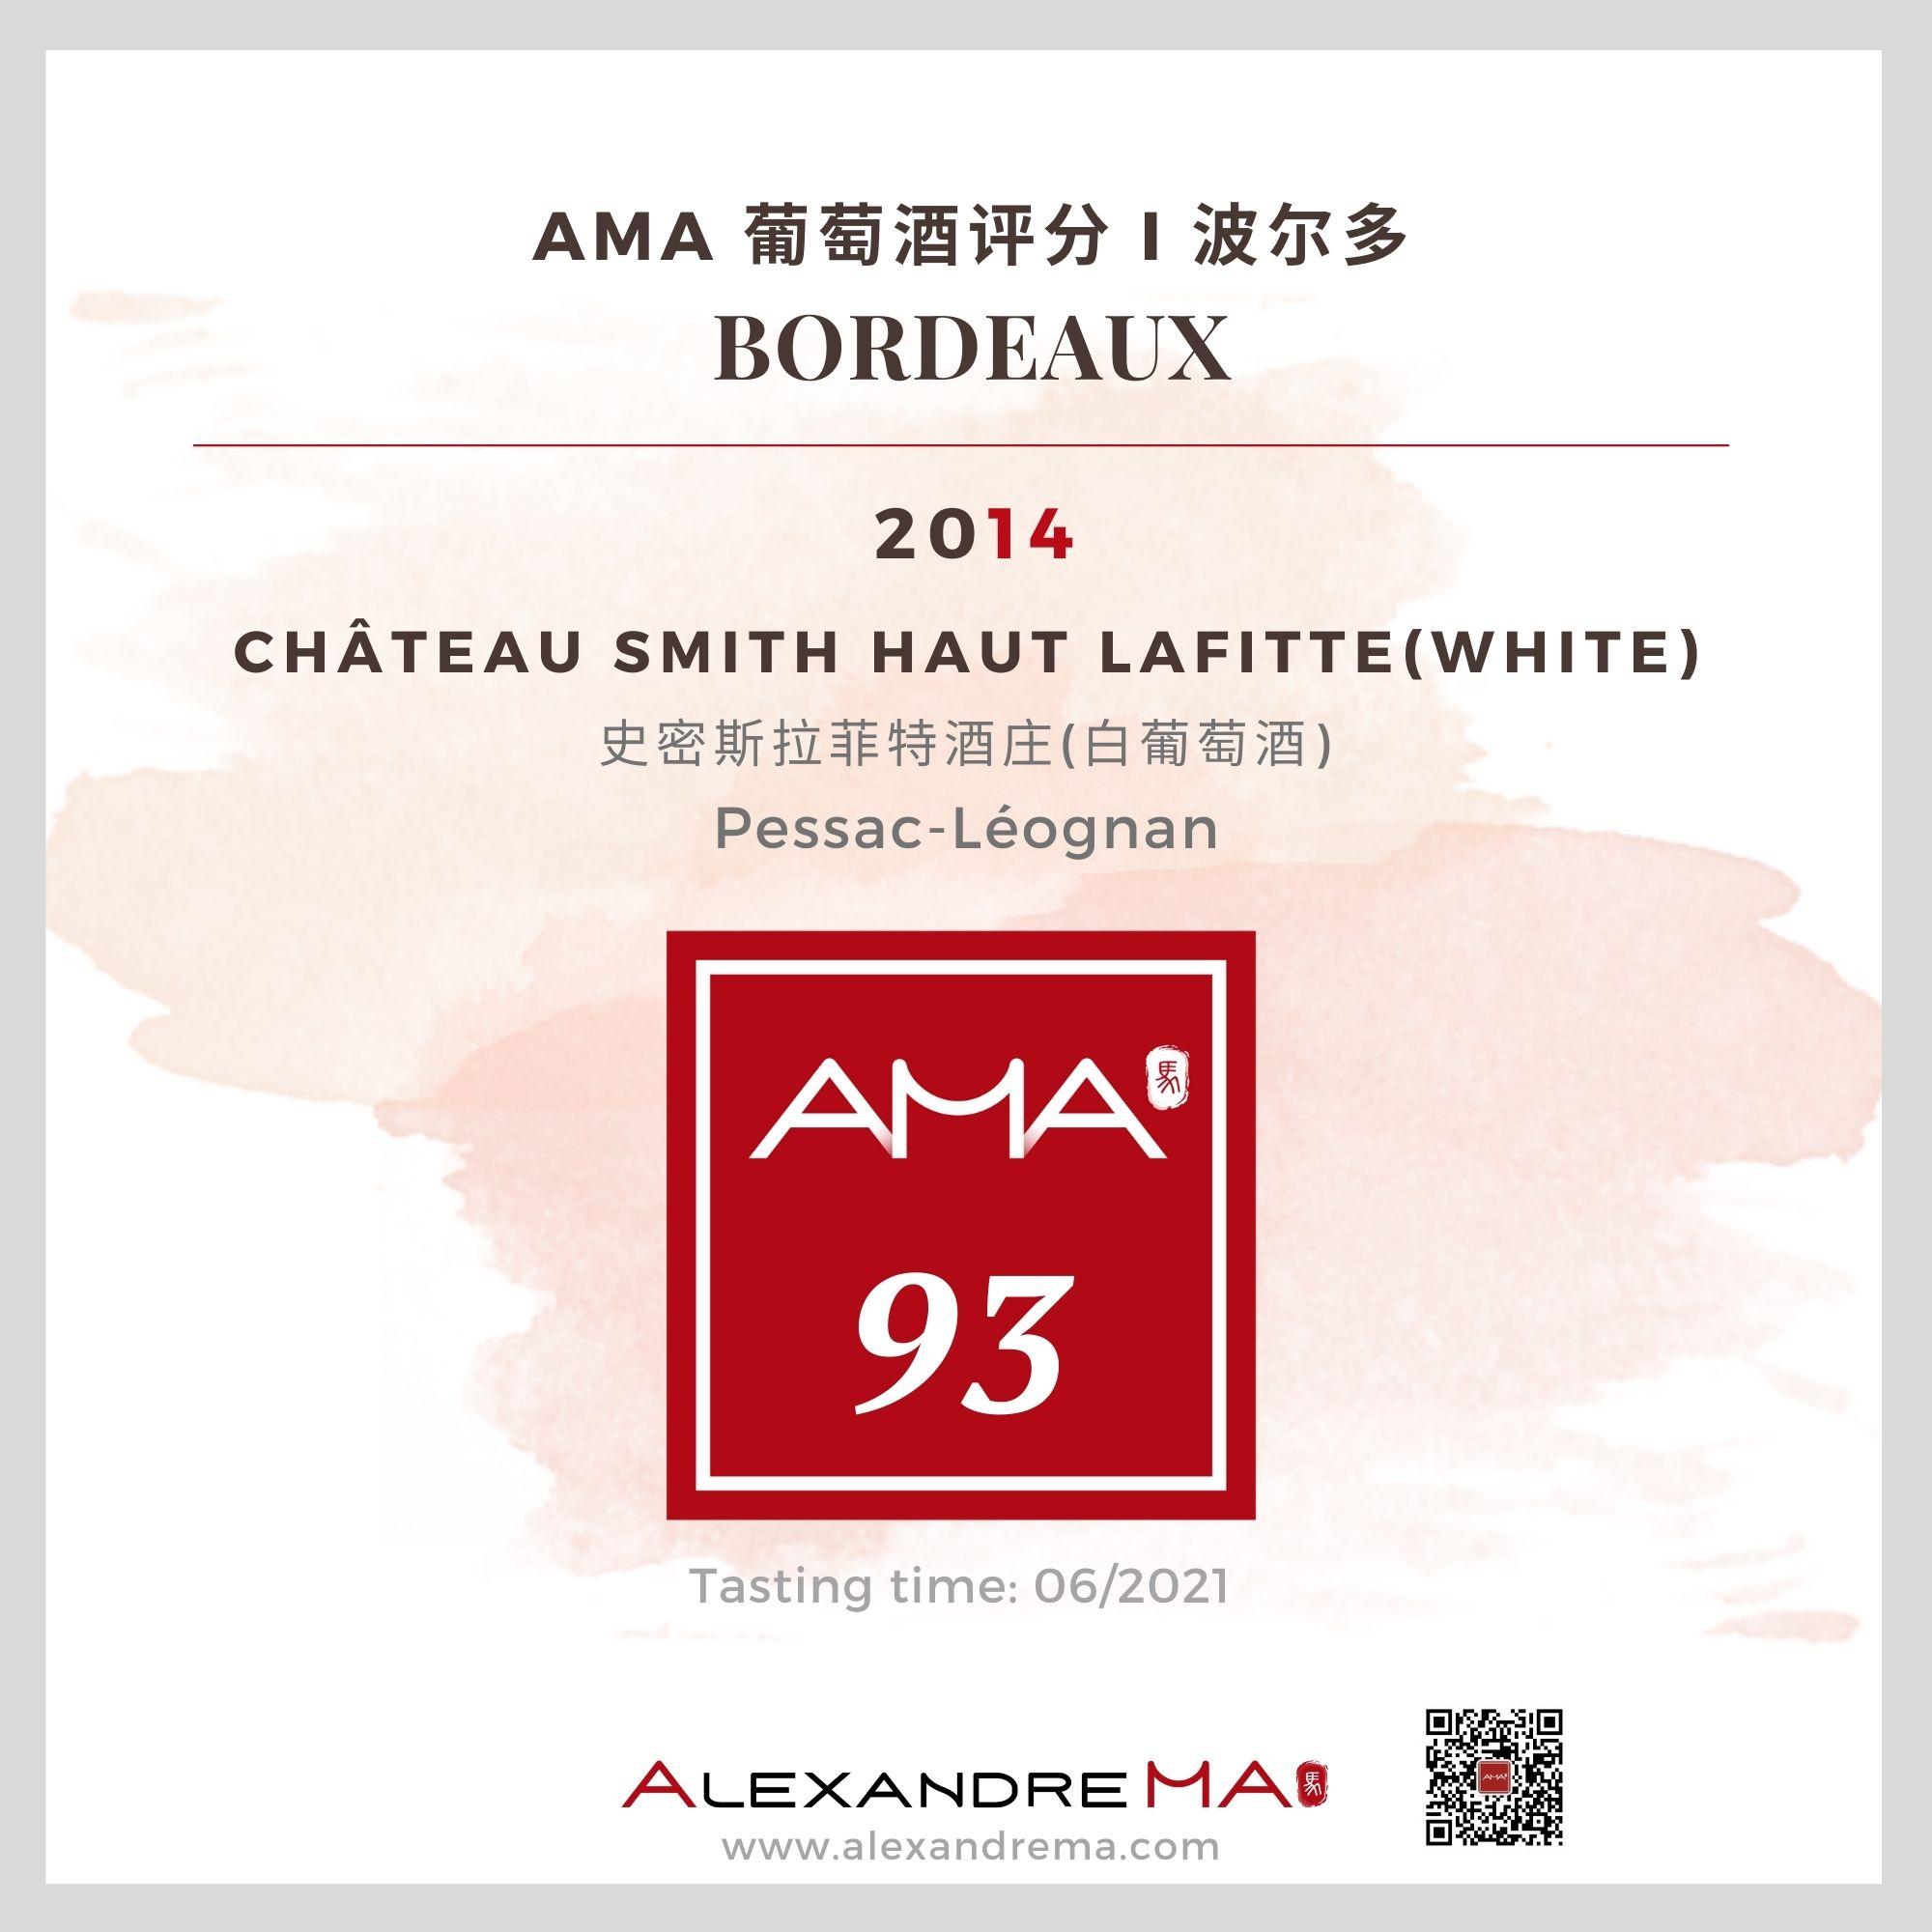 Château Smith Haut Lafitte White 2014 史密斯拉菲特酒庄 - Alexandre Ma